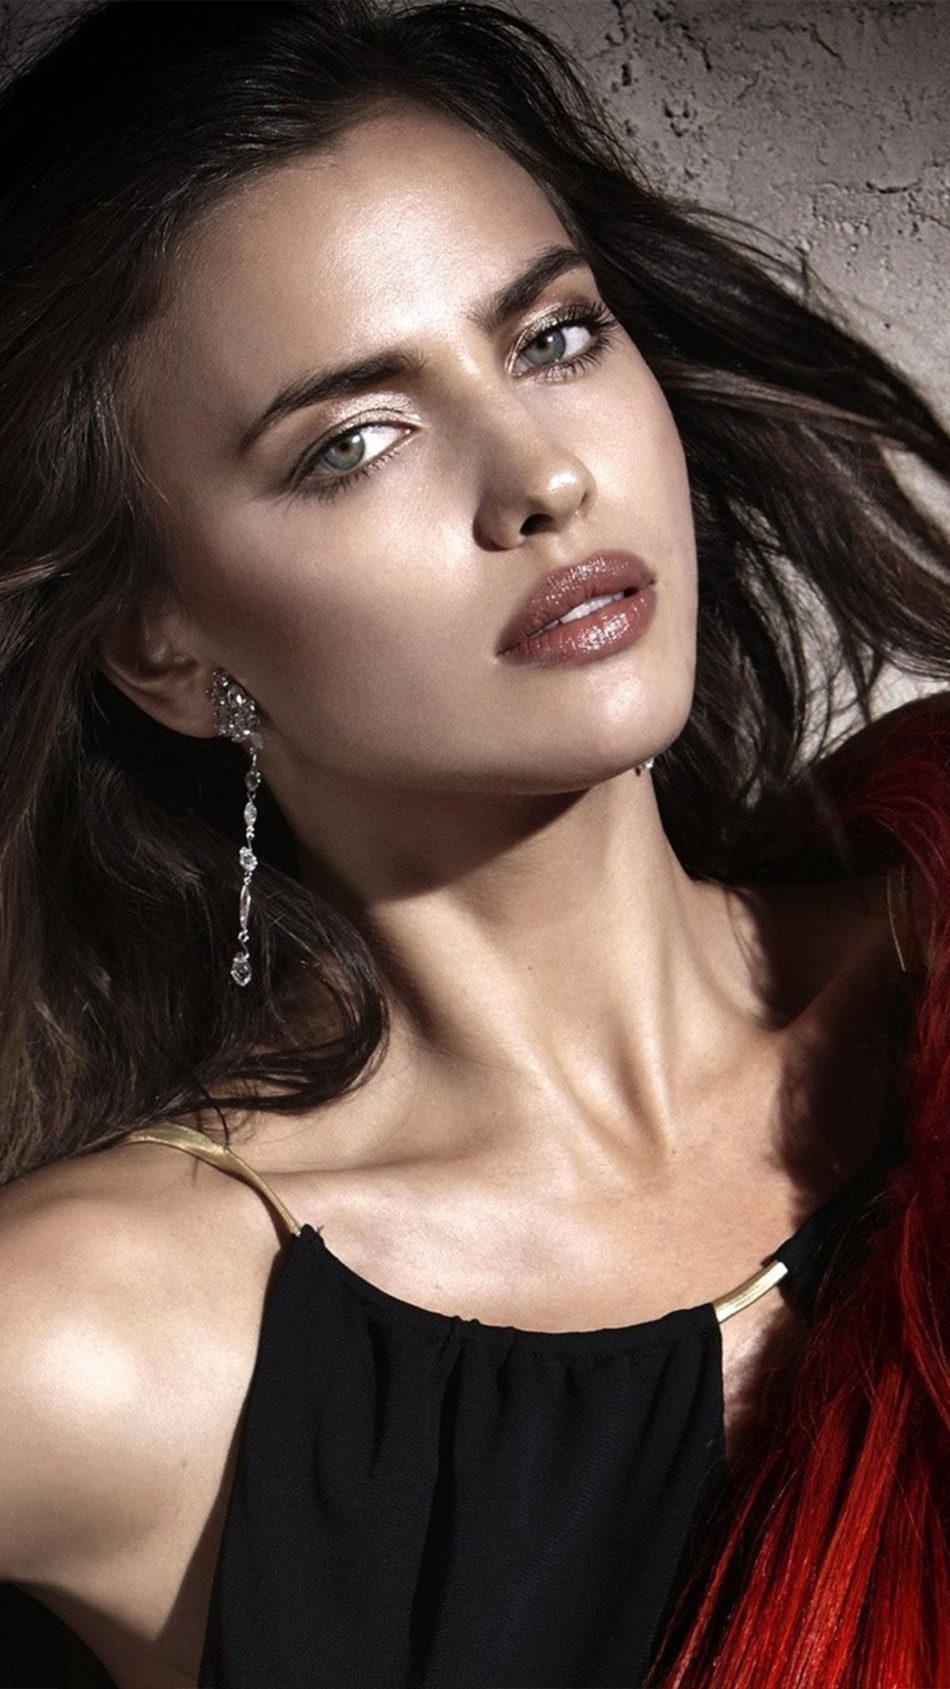 Model Irina Shayk 2021 4K Ultra HD Mobile Wallpaper